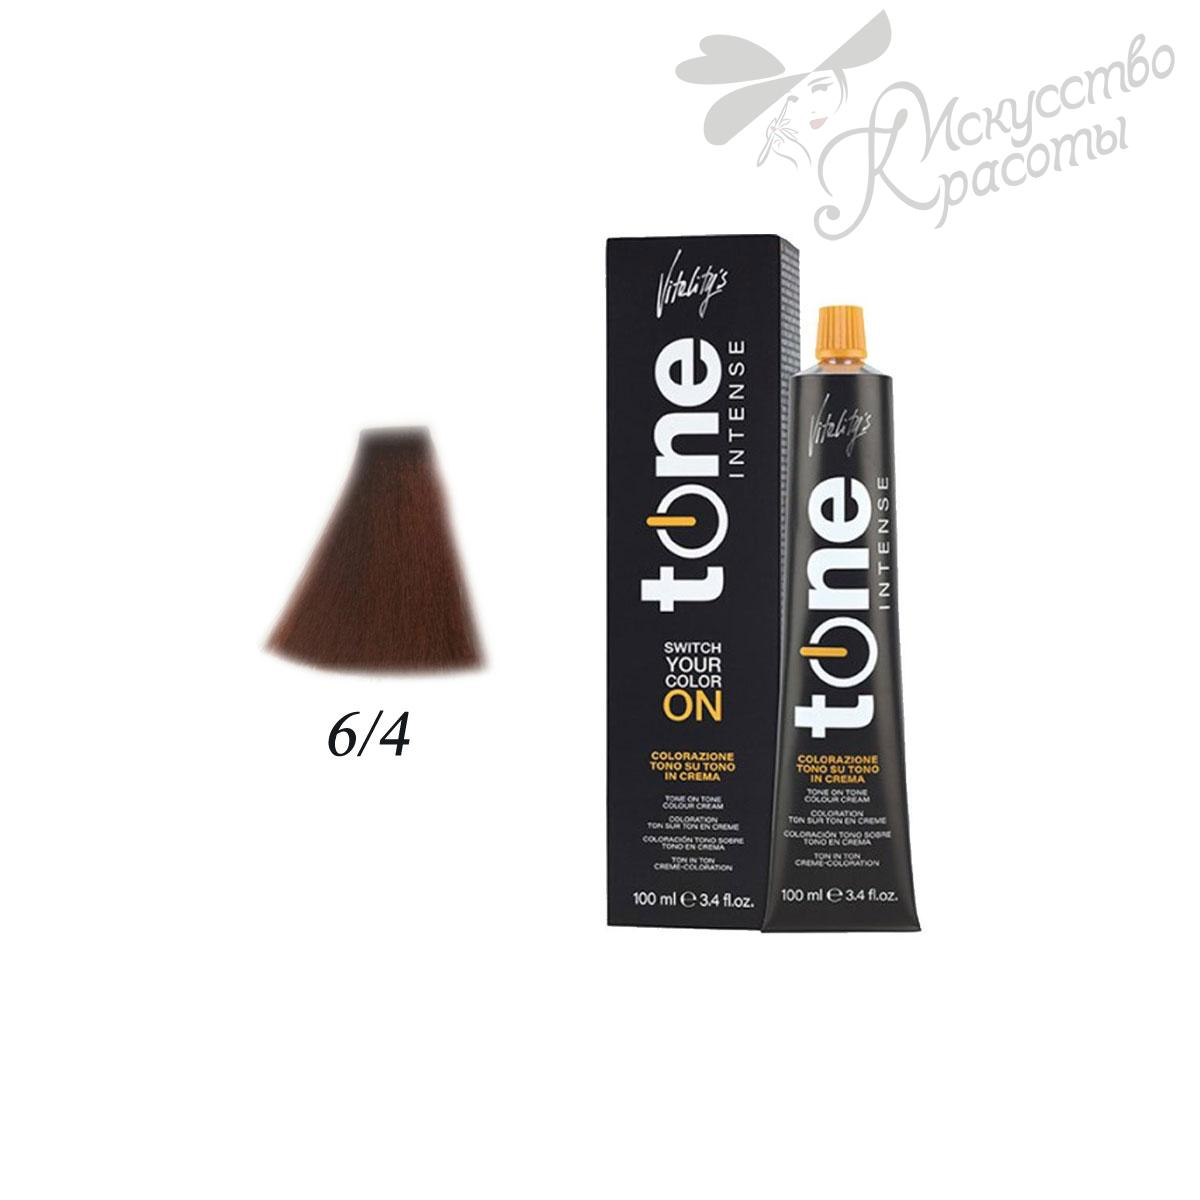 Краска для волос 6/4 медный темный блонд Tone Intense Vitality's 100мл